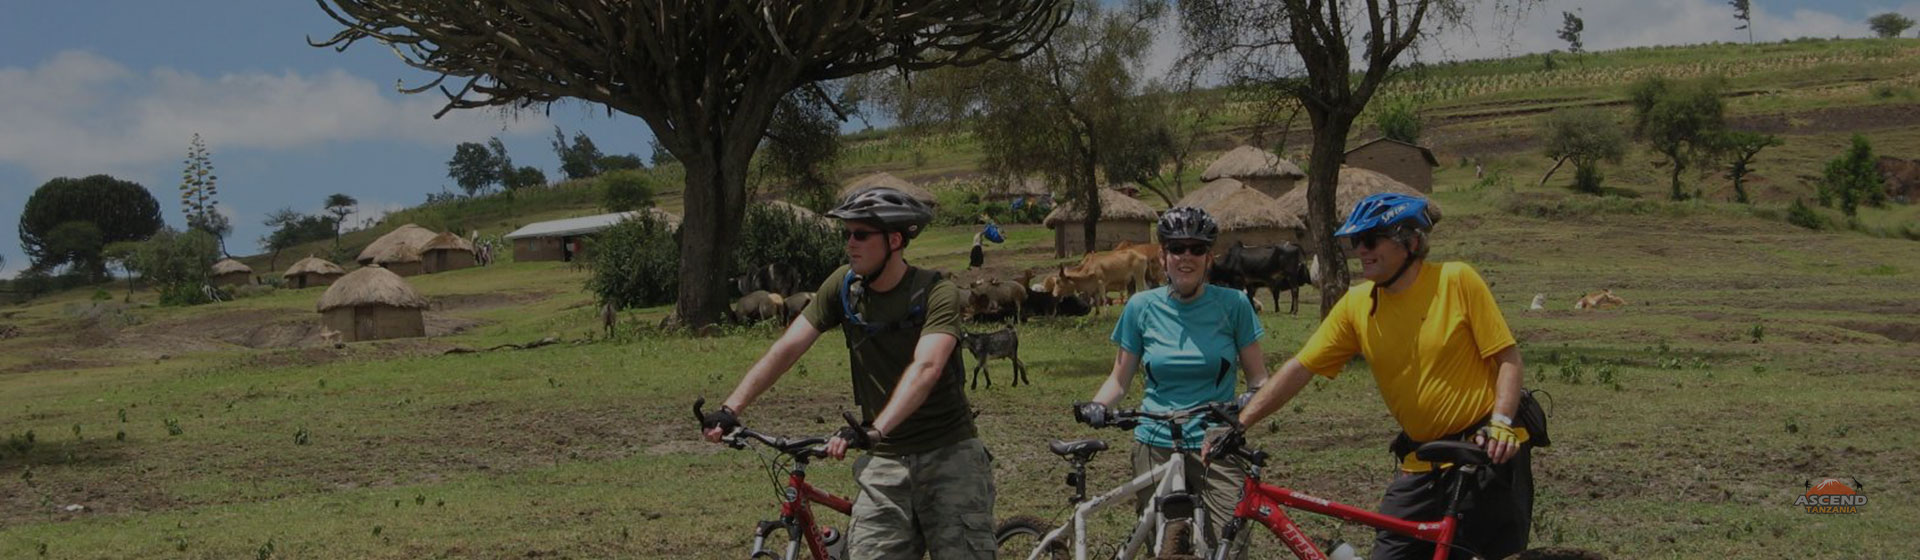 Tanzania Bike Tours